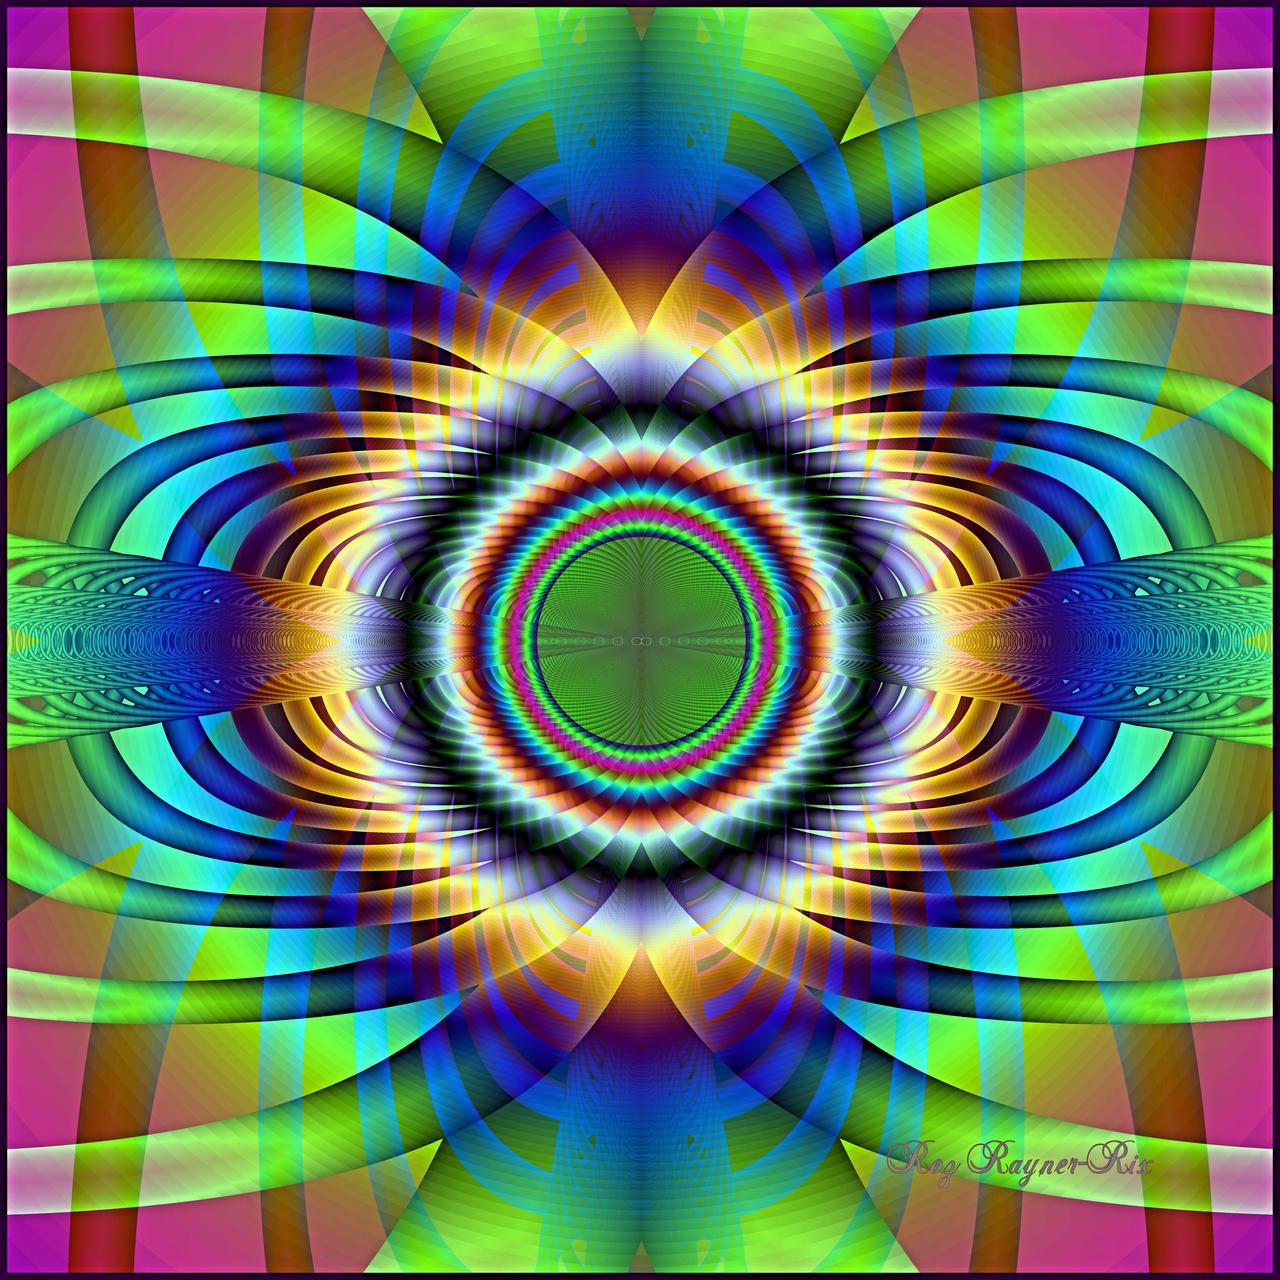 Celente Vision by Rozrr